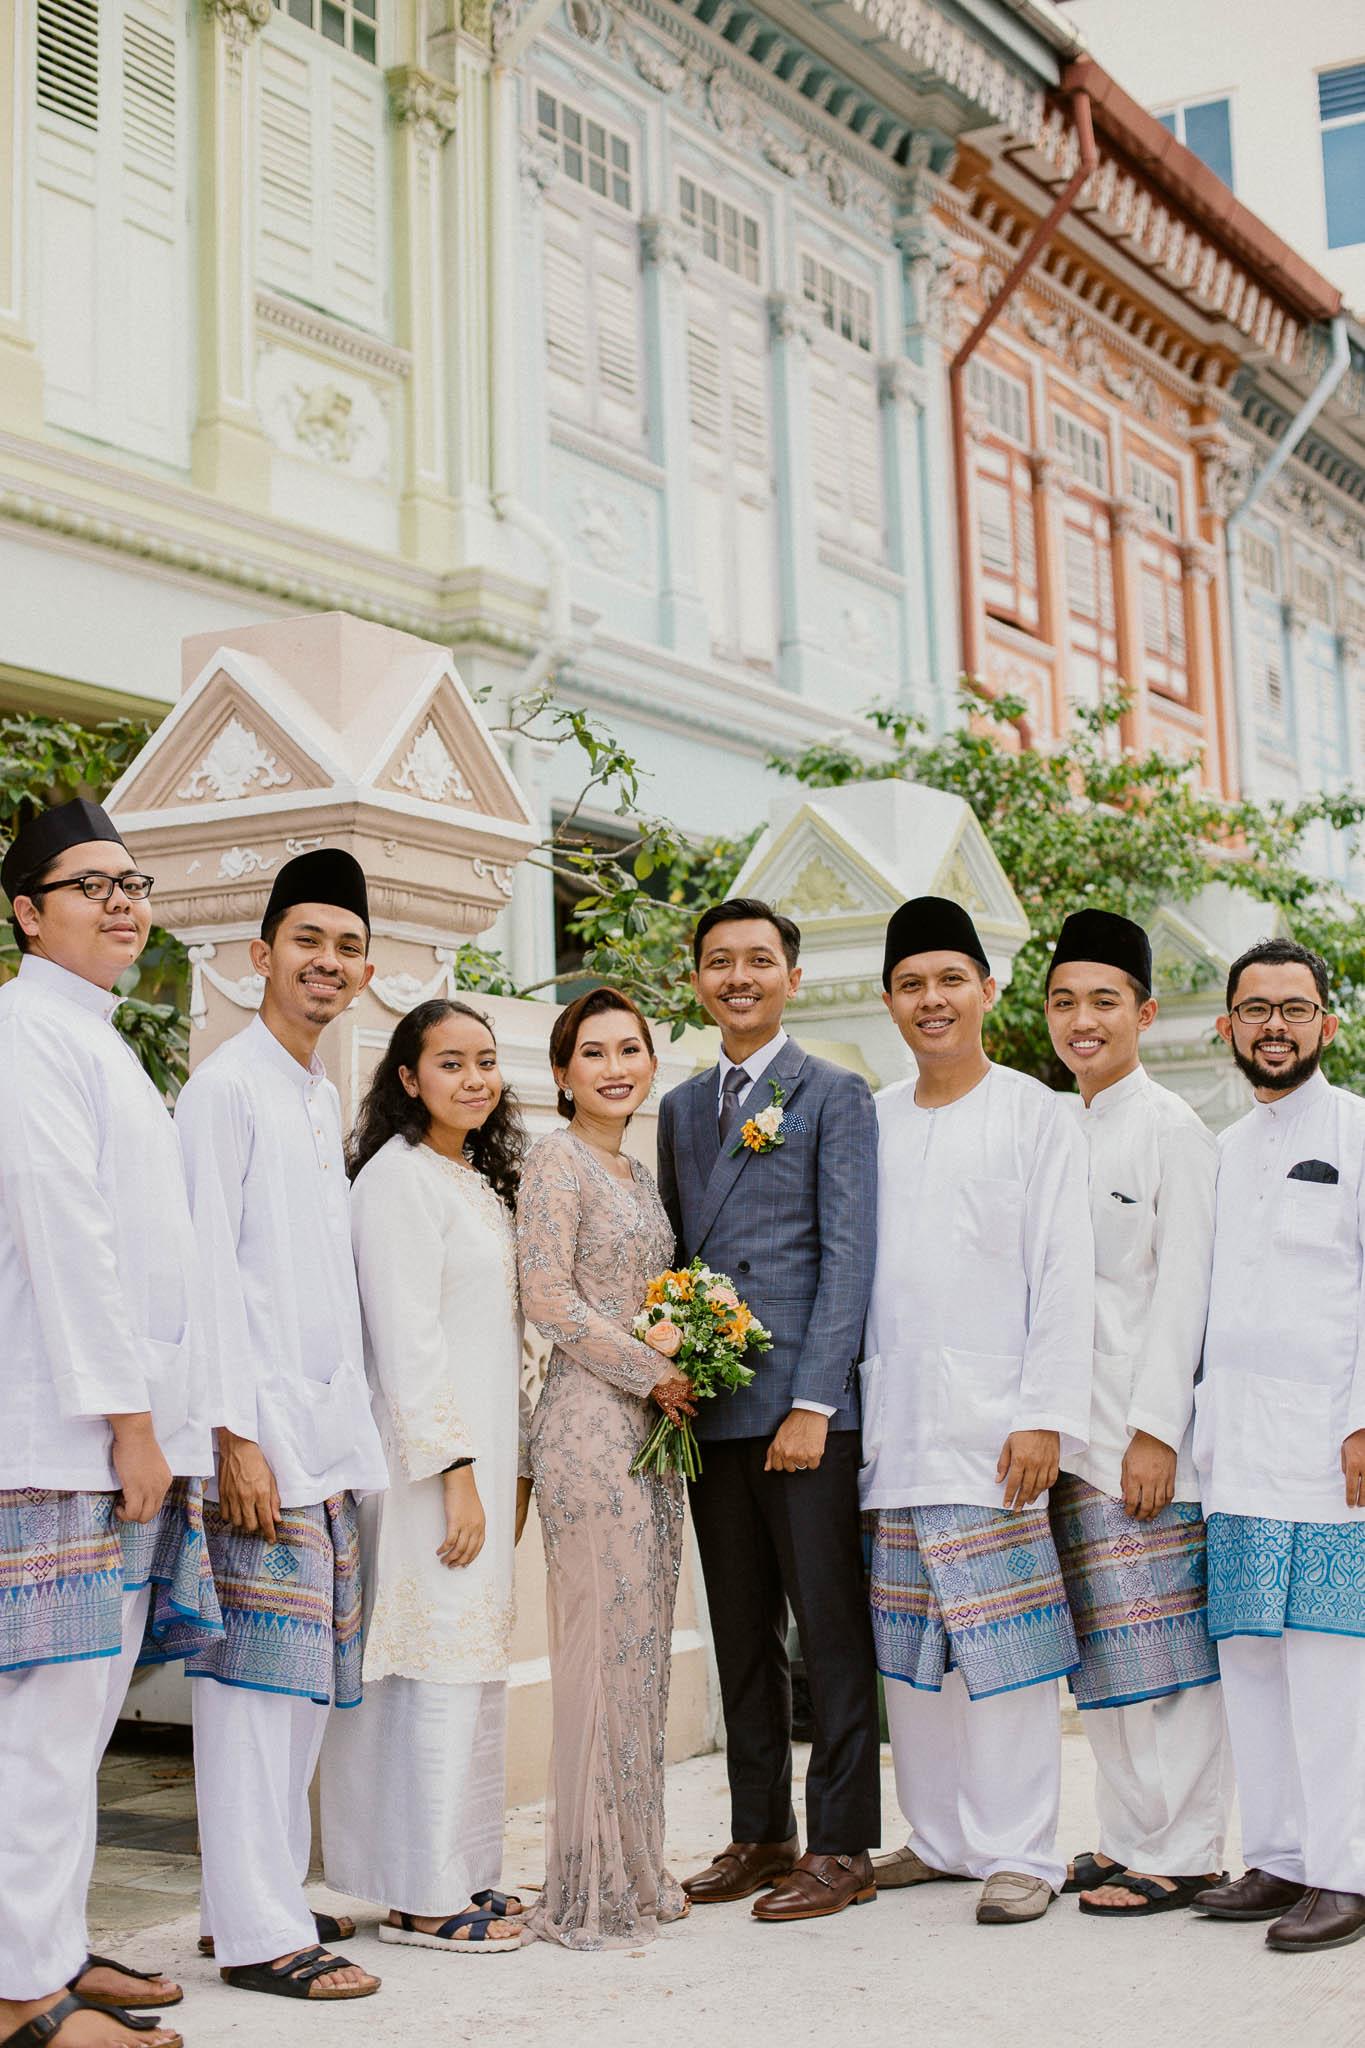 singapore-wedding-photographer-wedding-nufail-addafiq-074.jpg